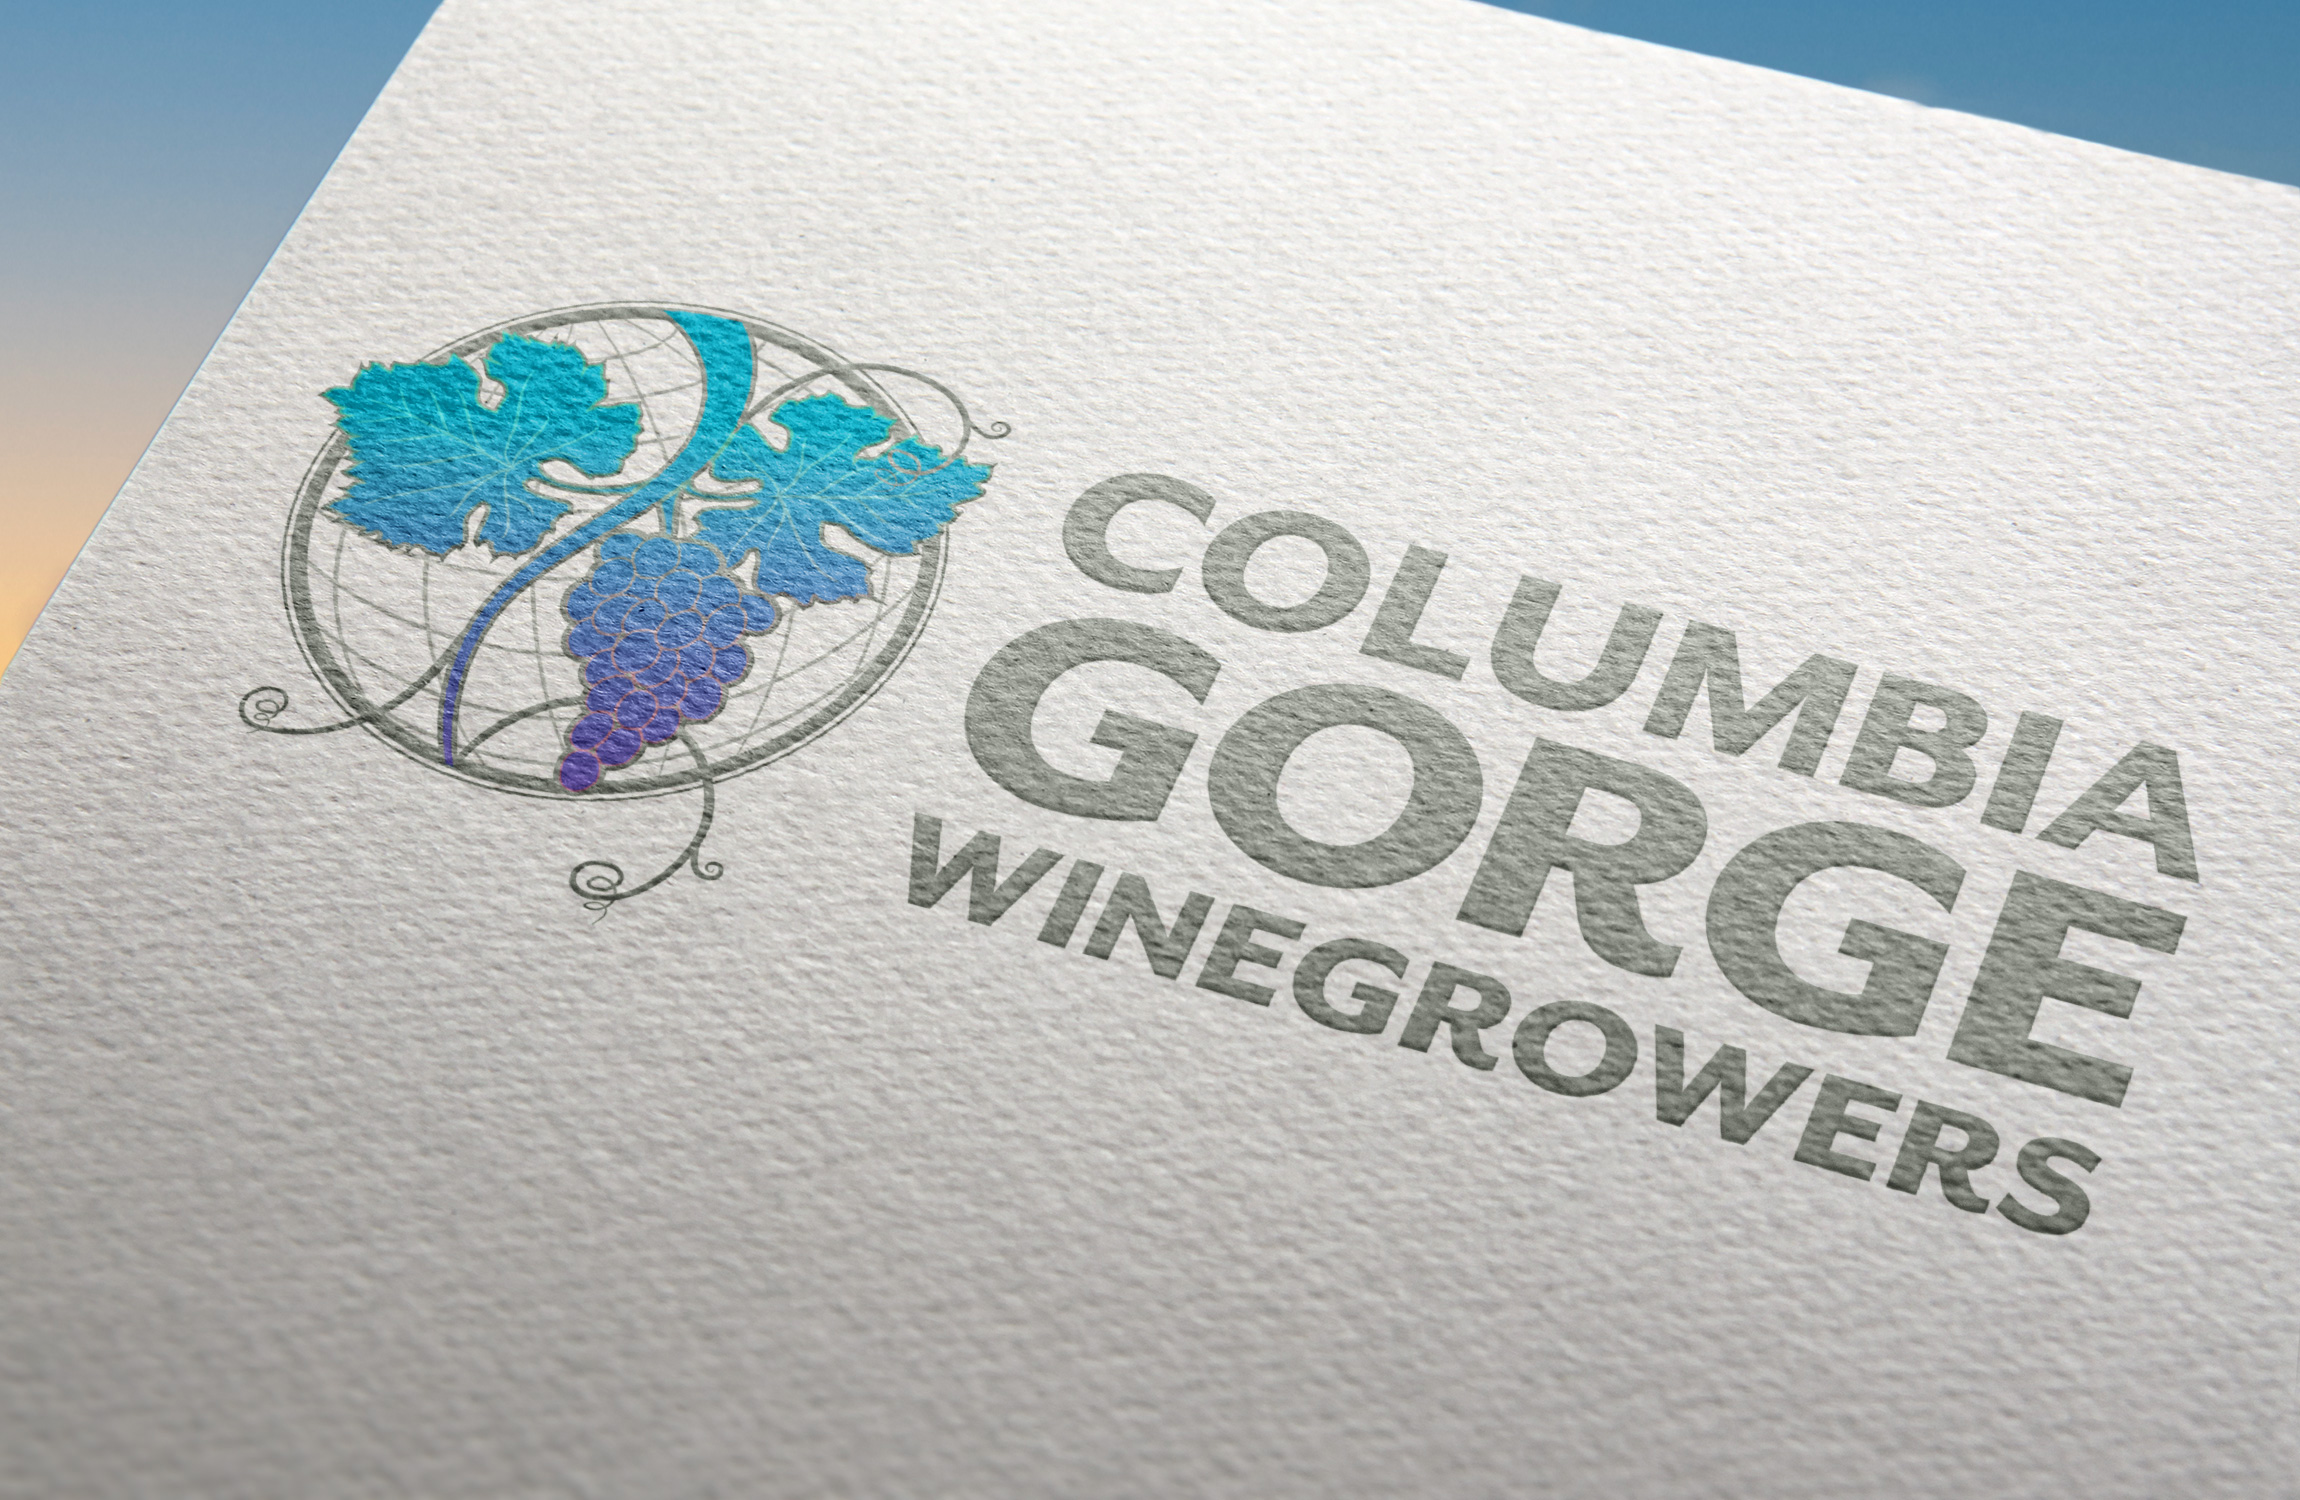 *Columbia Gorge Winegrowers Assoc. Identity